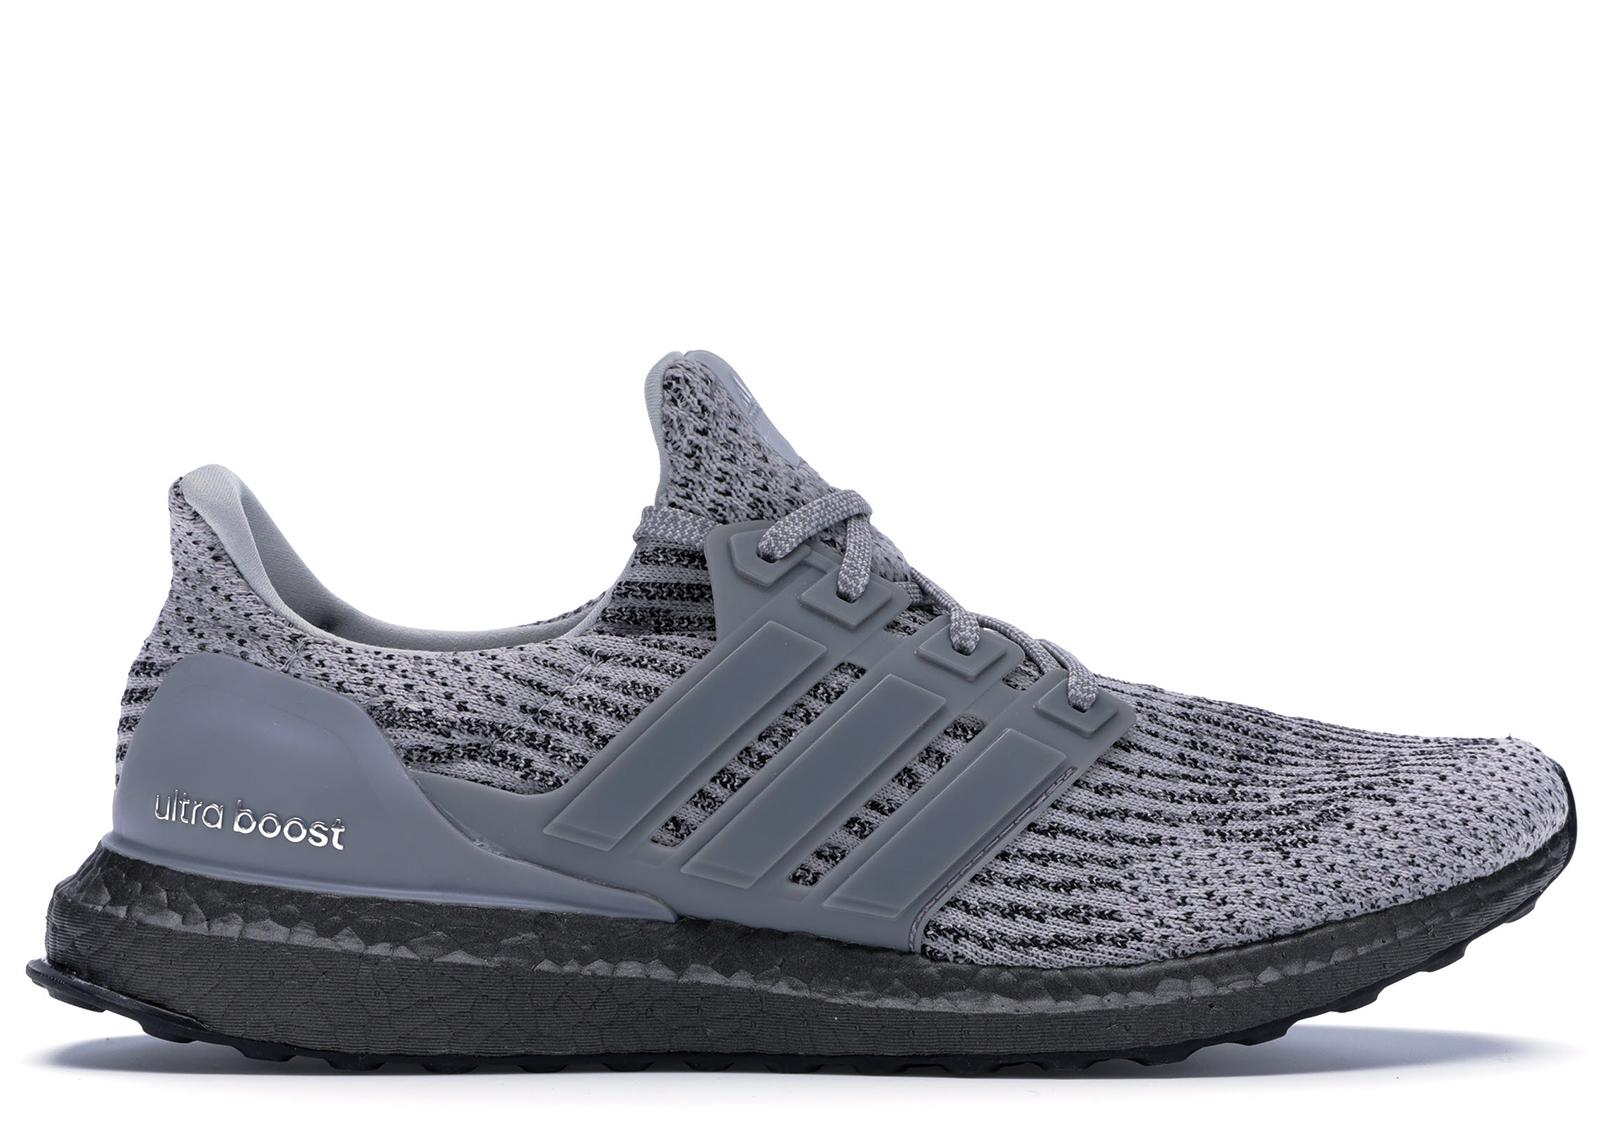 7ee3e46a606 new zealand adidas ultra boost 3.0 triple grey cg3041 9ce08 99605